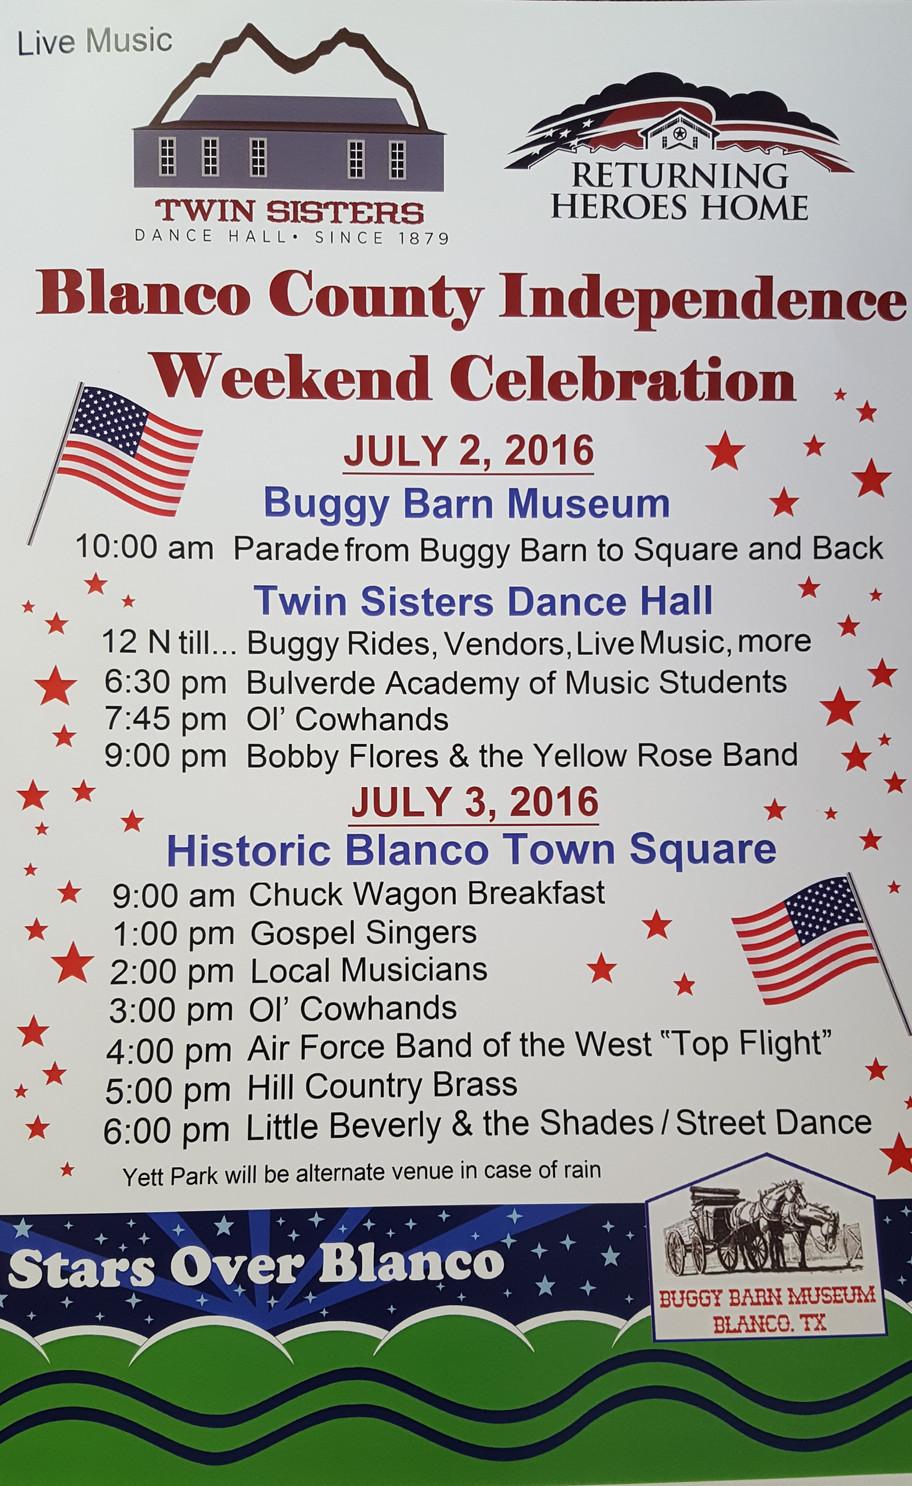 Blanco County Independence Weekend Celebration